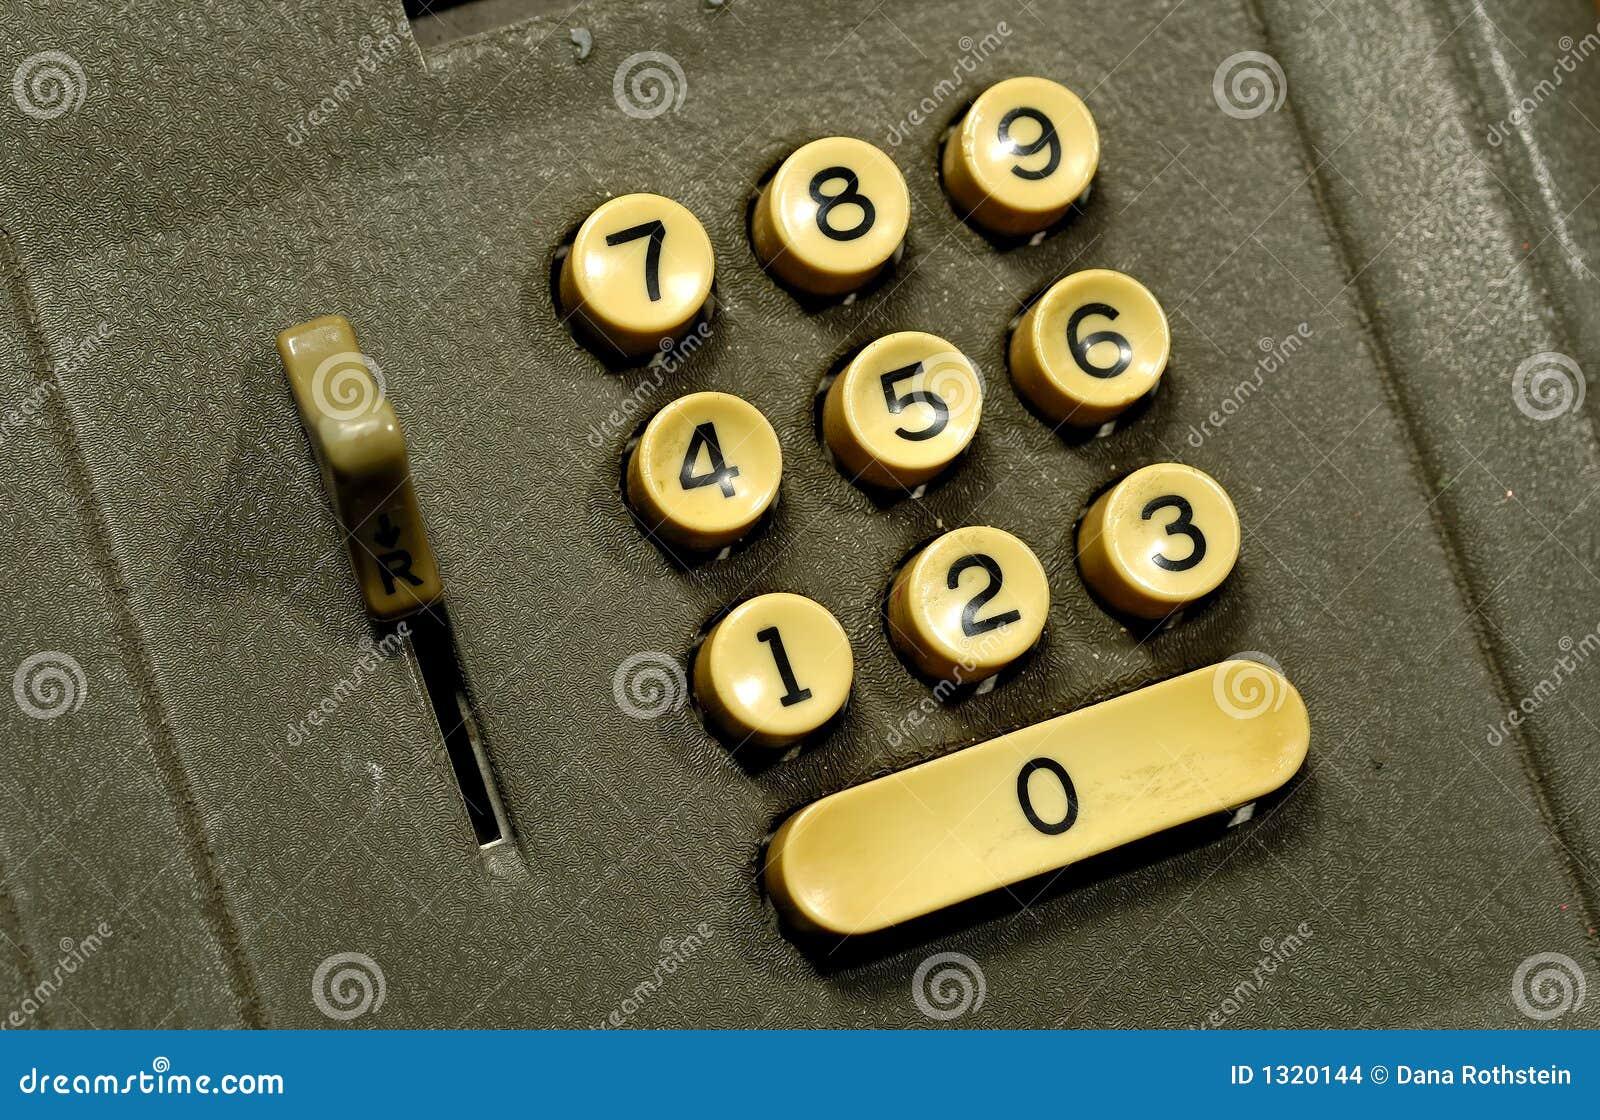 adding machine buttons